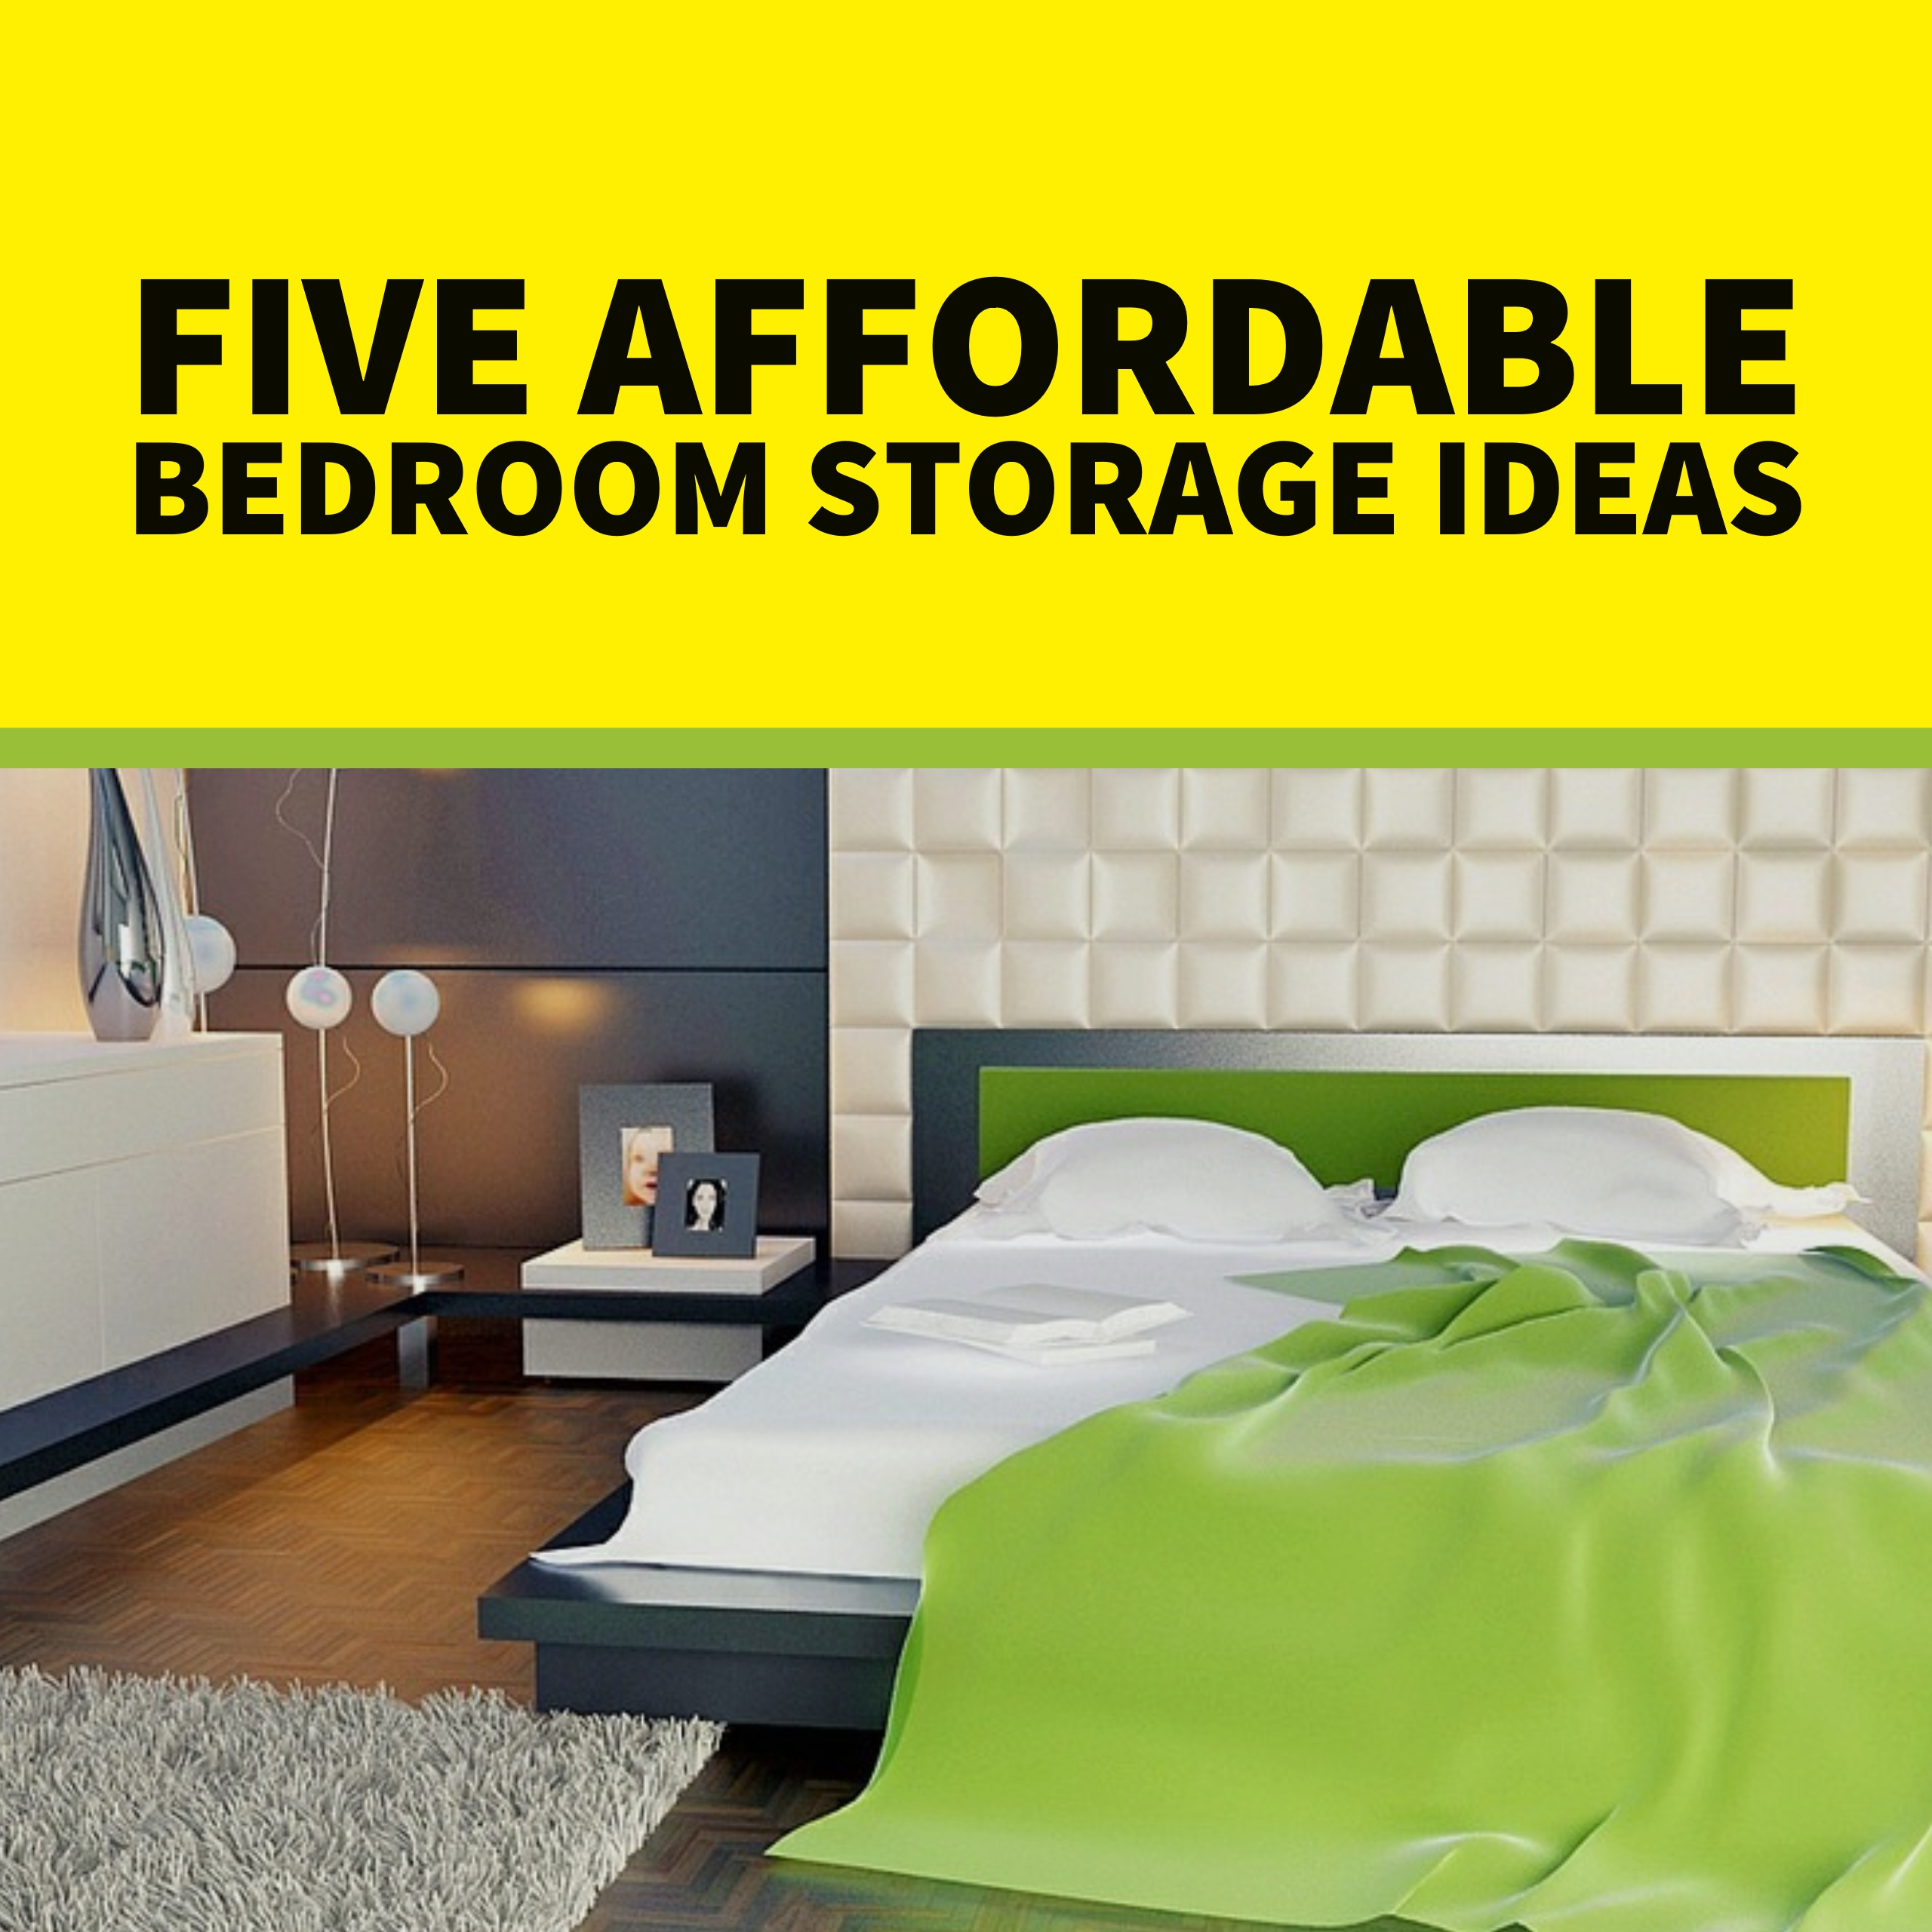 Affordable Bedroom Storage Ideas